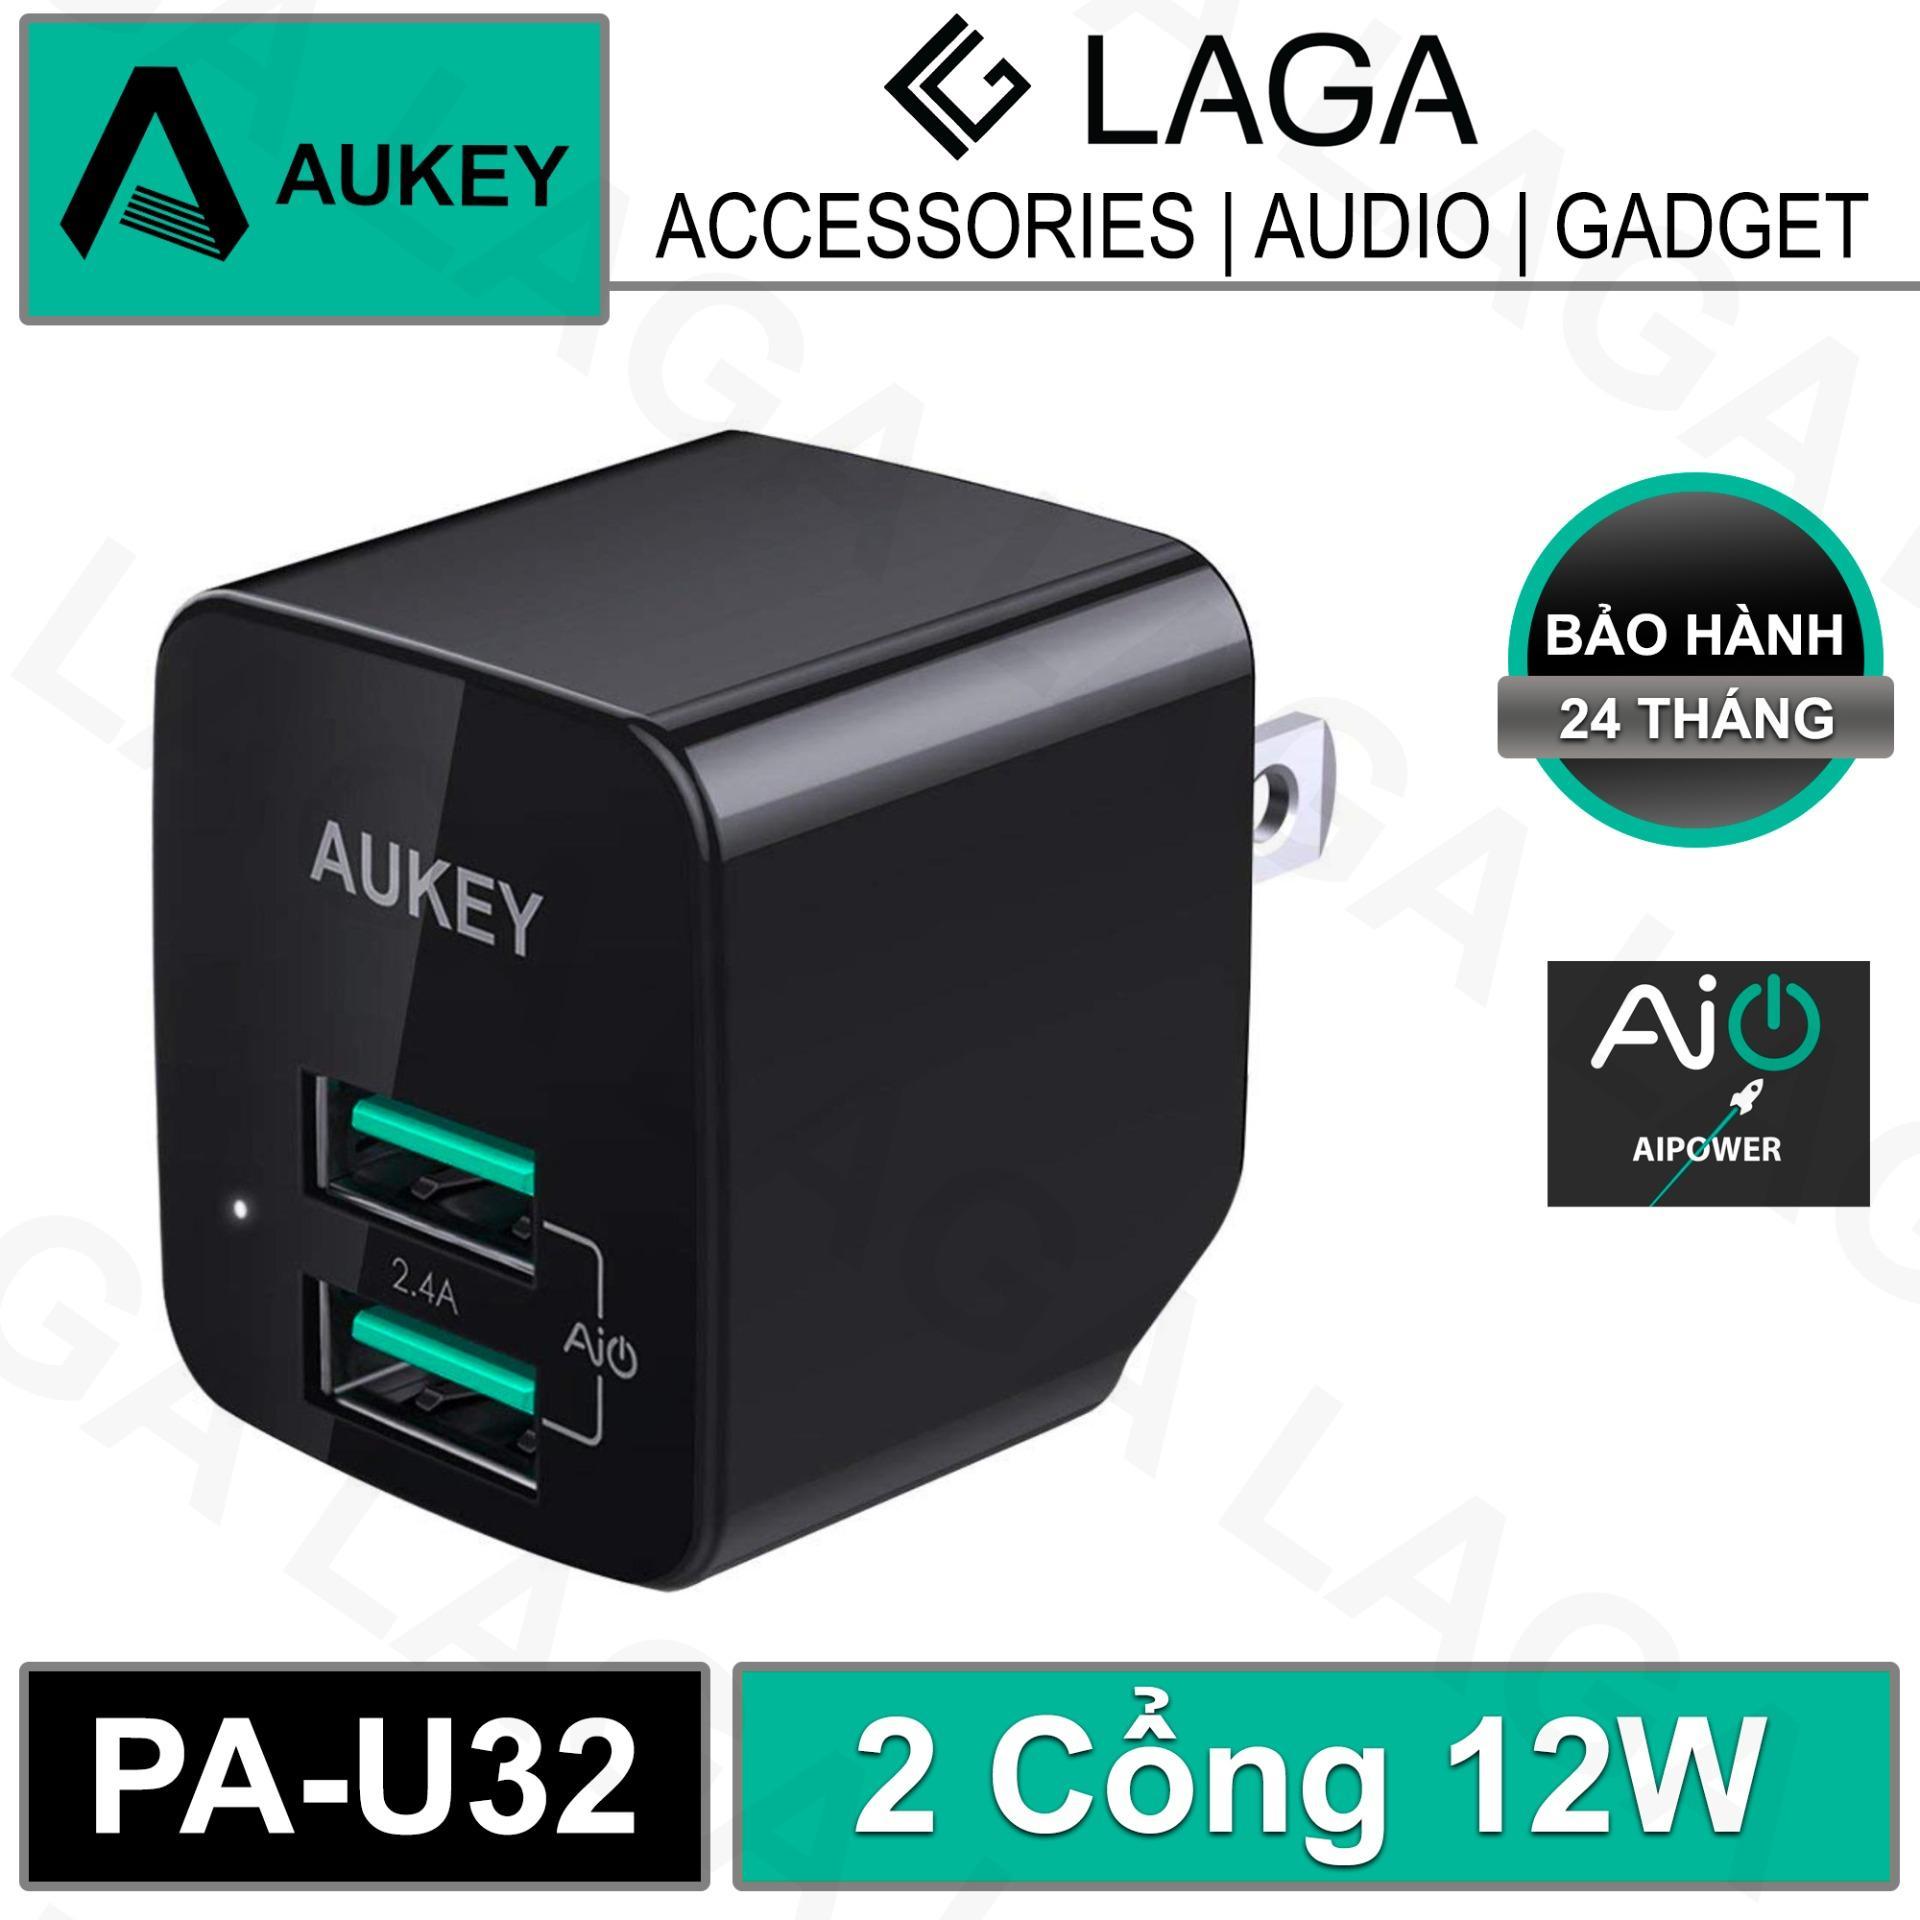 Cốc Sạc Mini Aukey 2 Cổng 12W AiPower - PA-U32